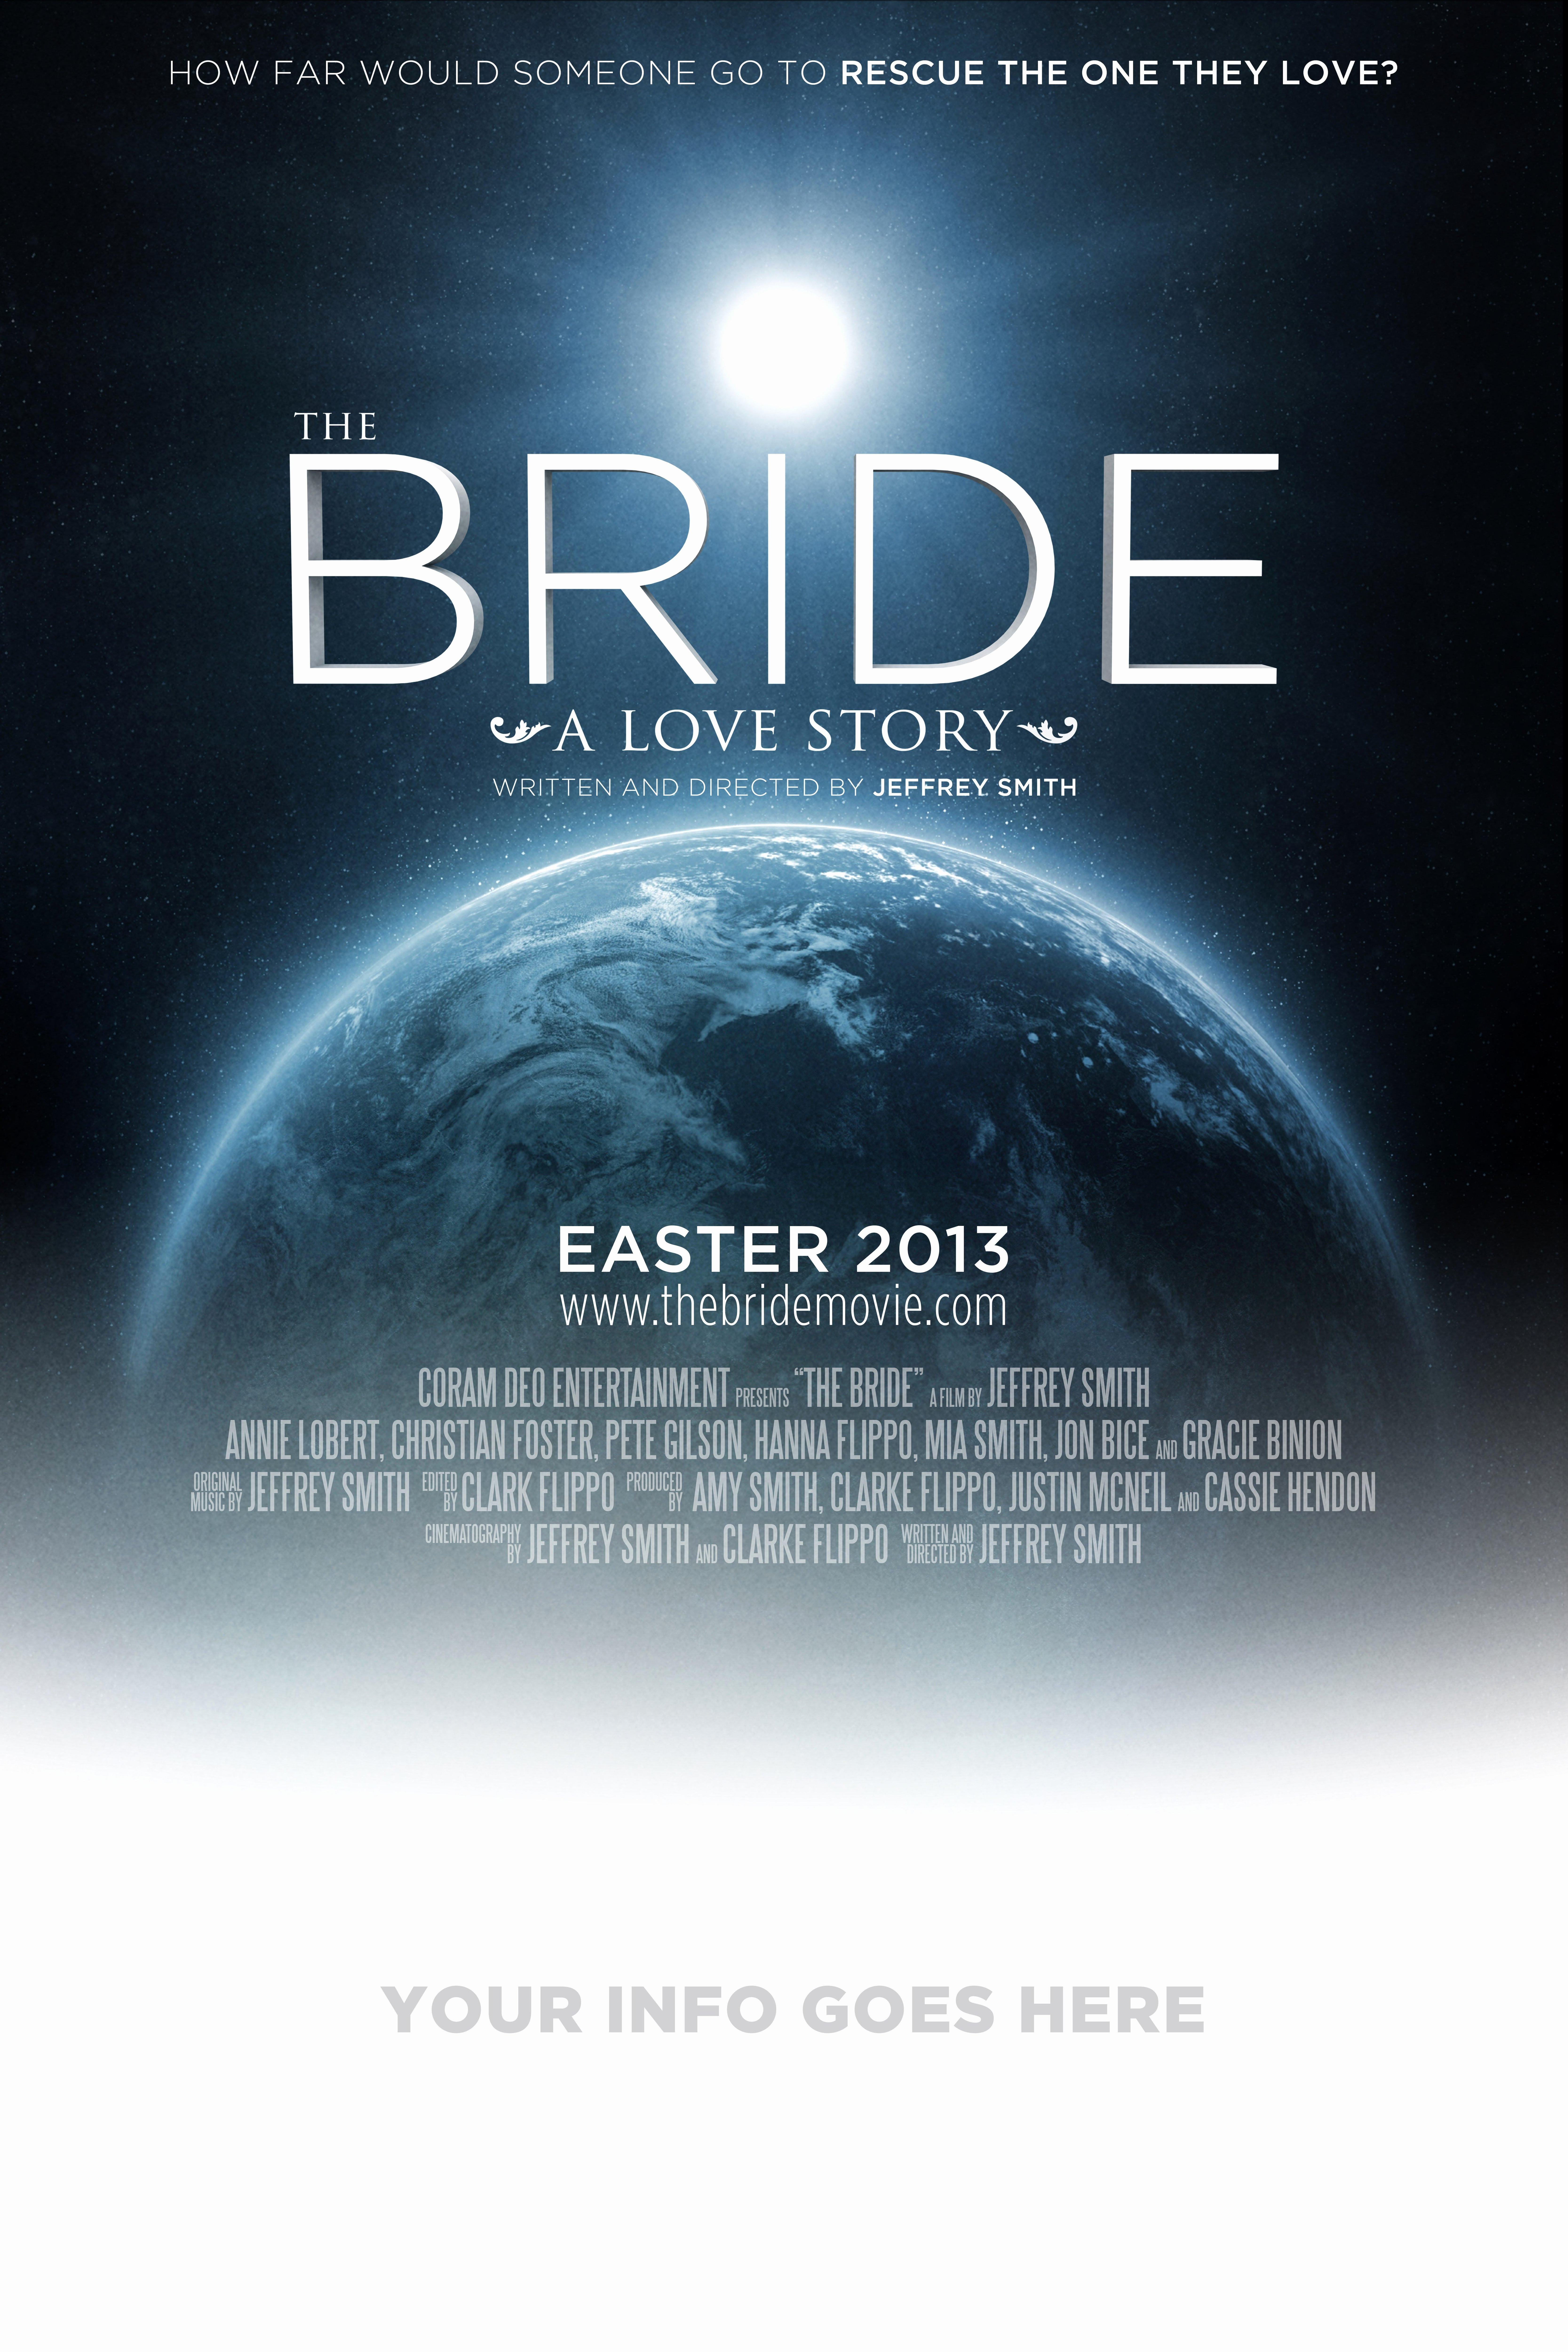 Movie Poster Design Template Inspirational 9 Best Of Movie Poster Template Blank Movie